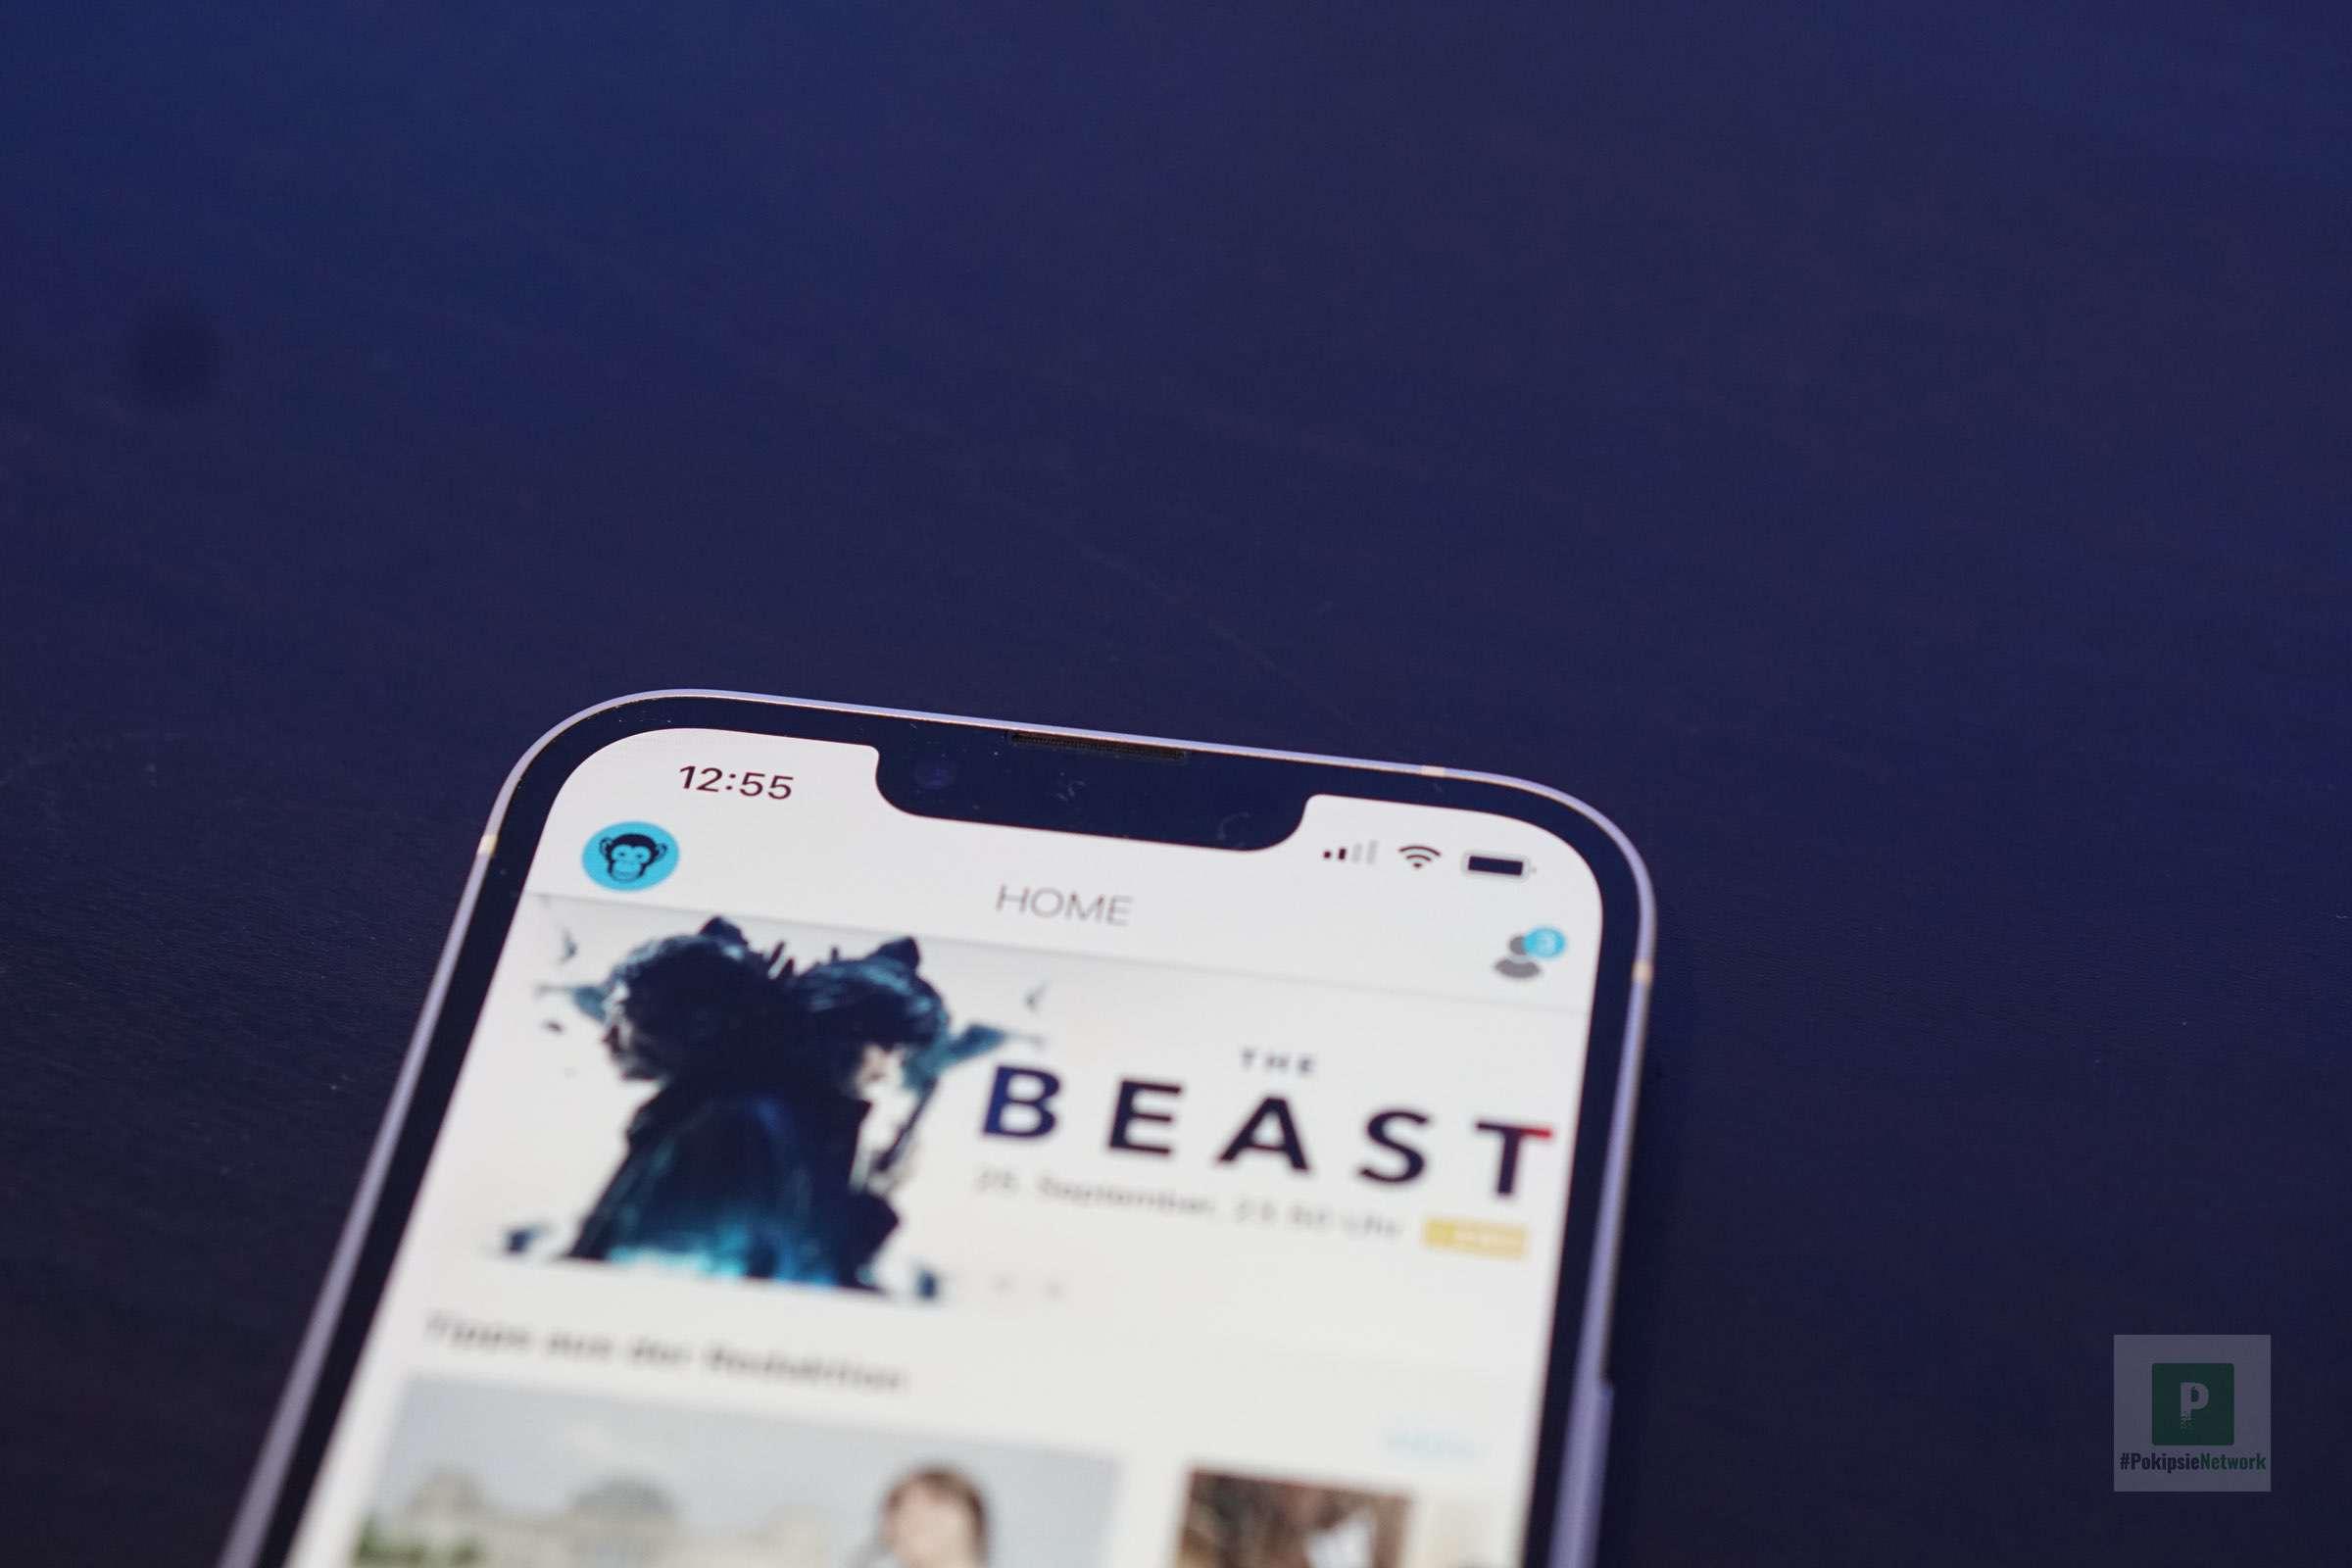 Teleboy App auf dem iPhone